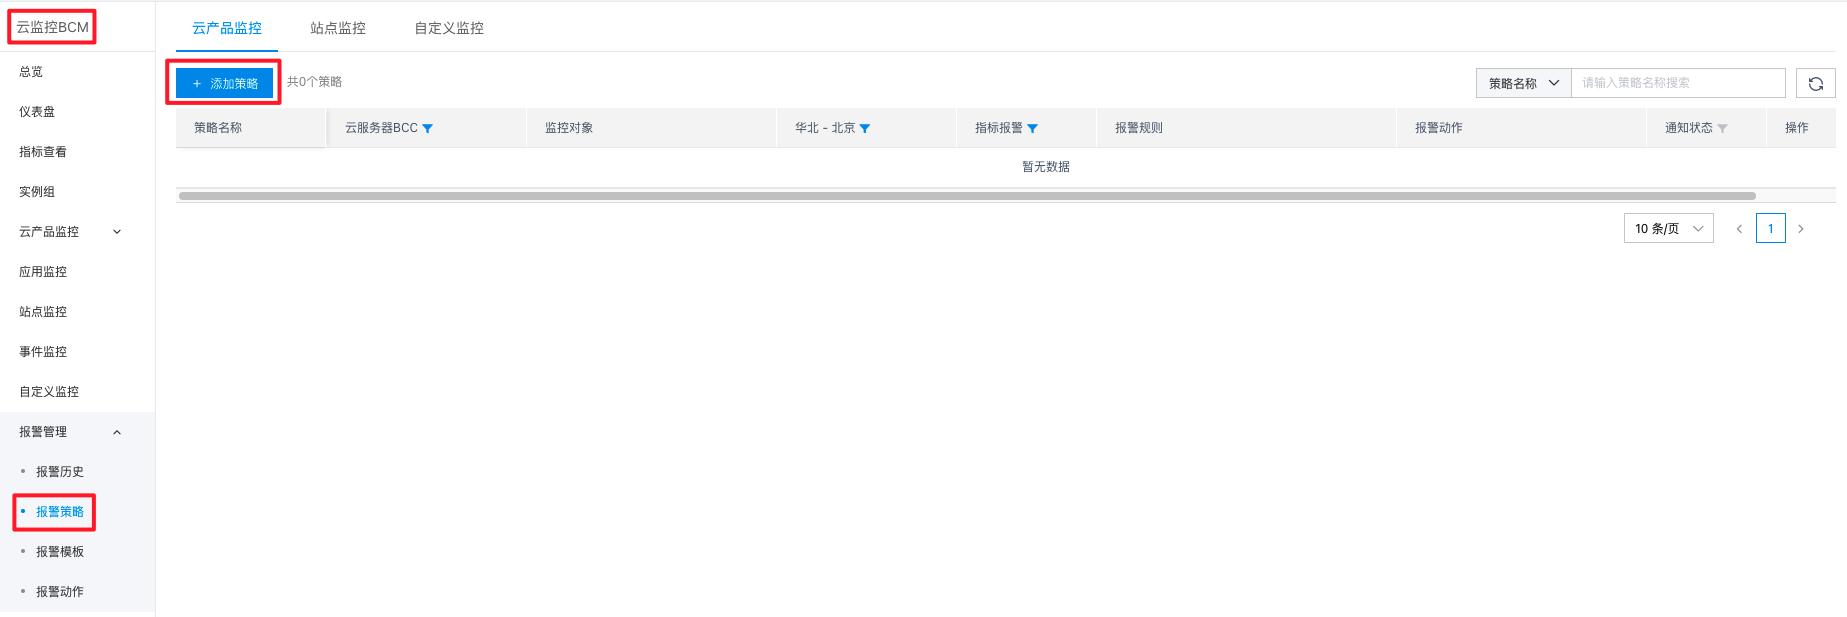 infoflow 2021-05-20 11-29-08.png